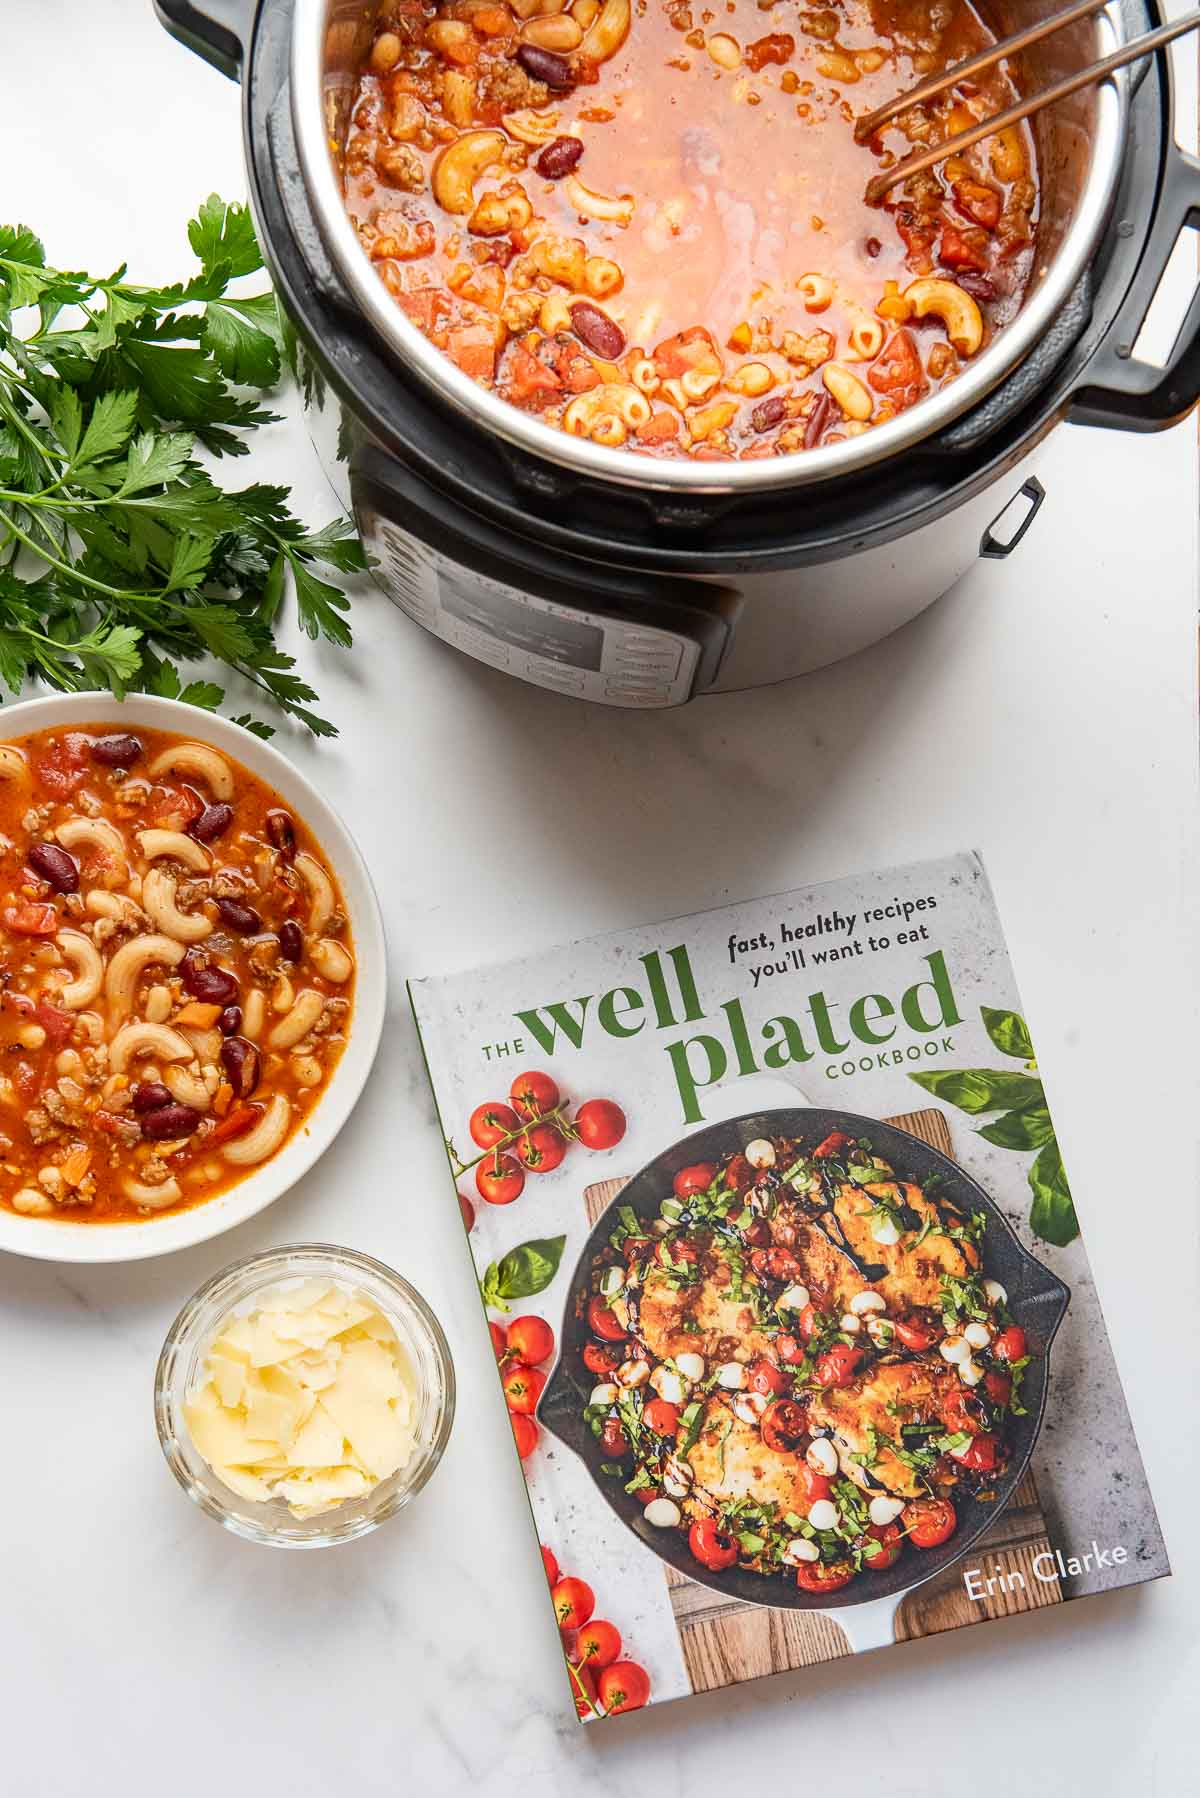 pasta e fagioli with cookbook